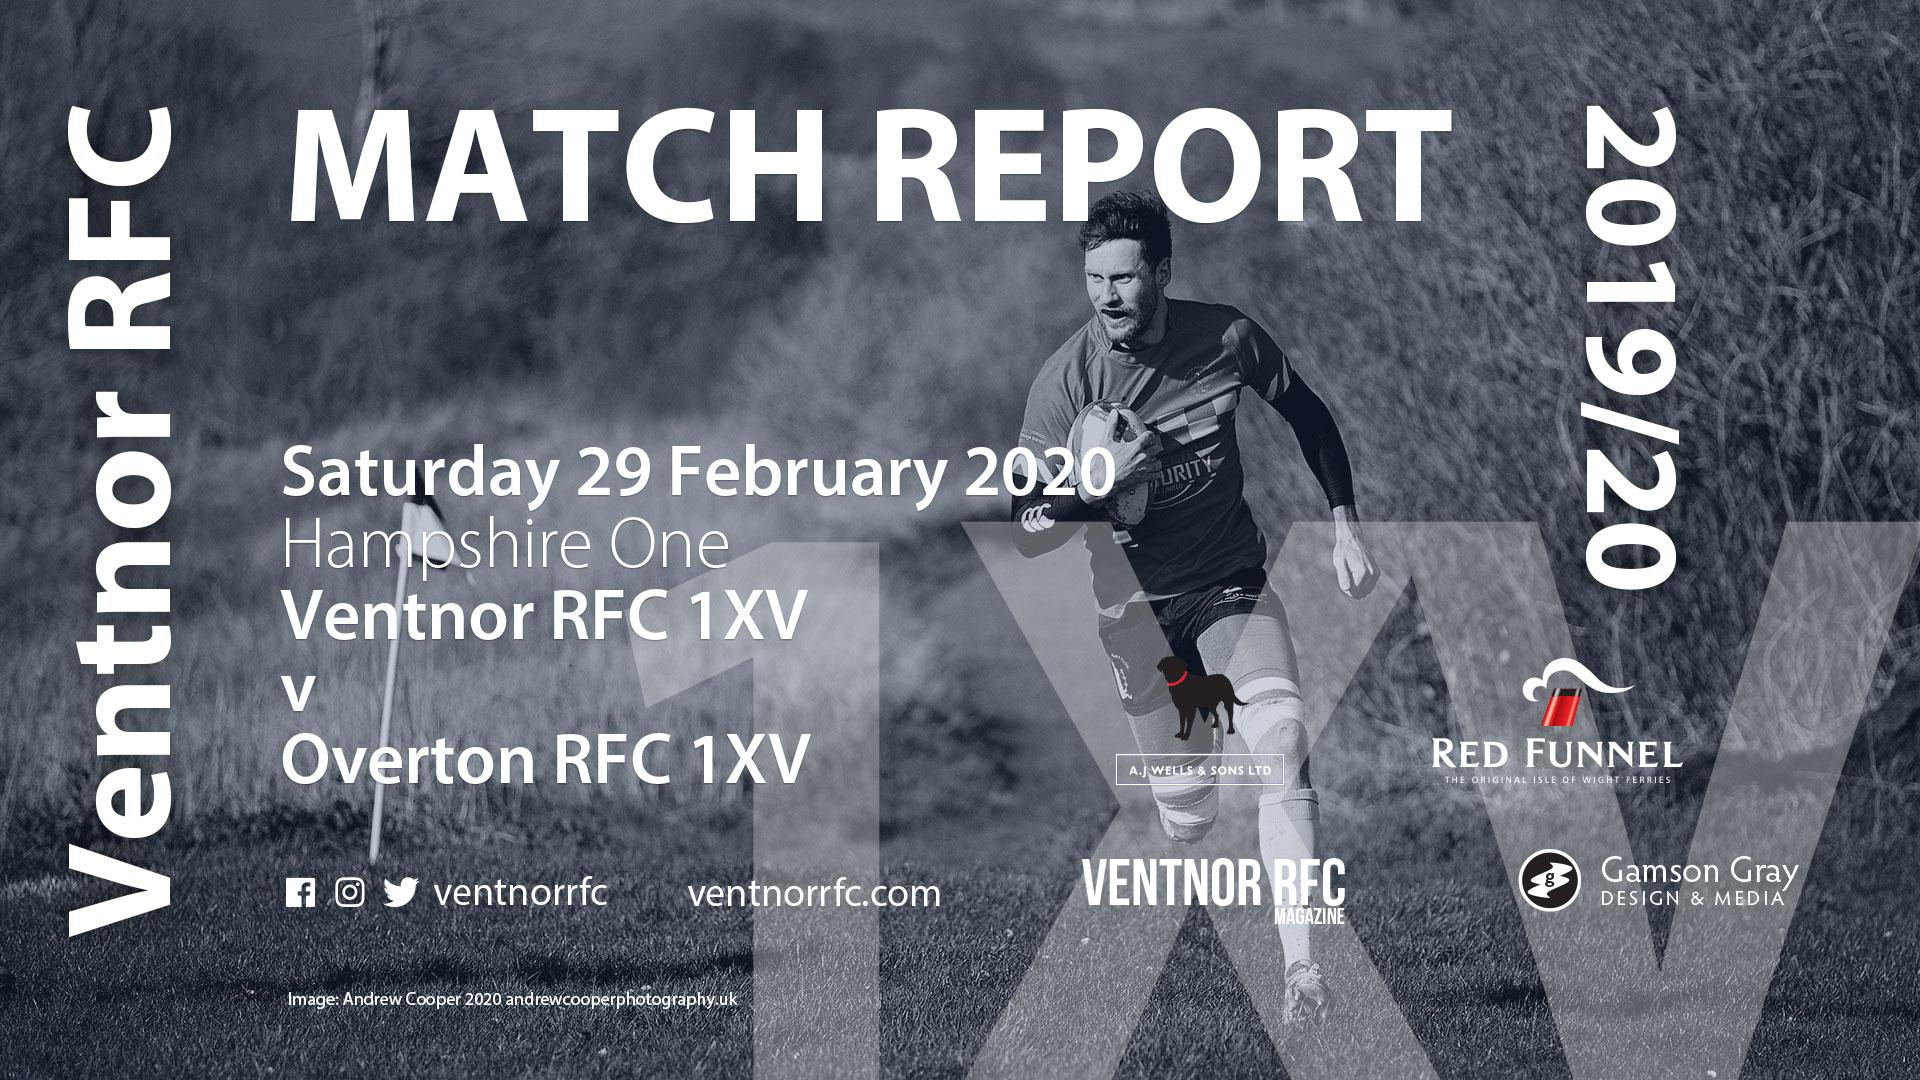 ventnor-rfc-v-overton-rfc-match-report-29022020-fb